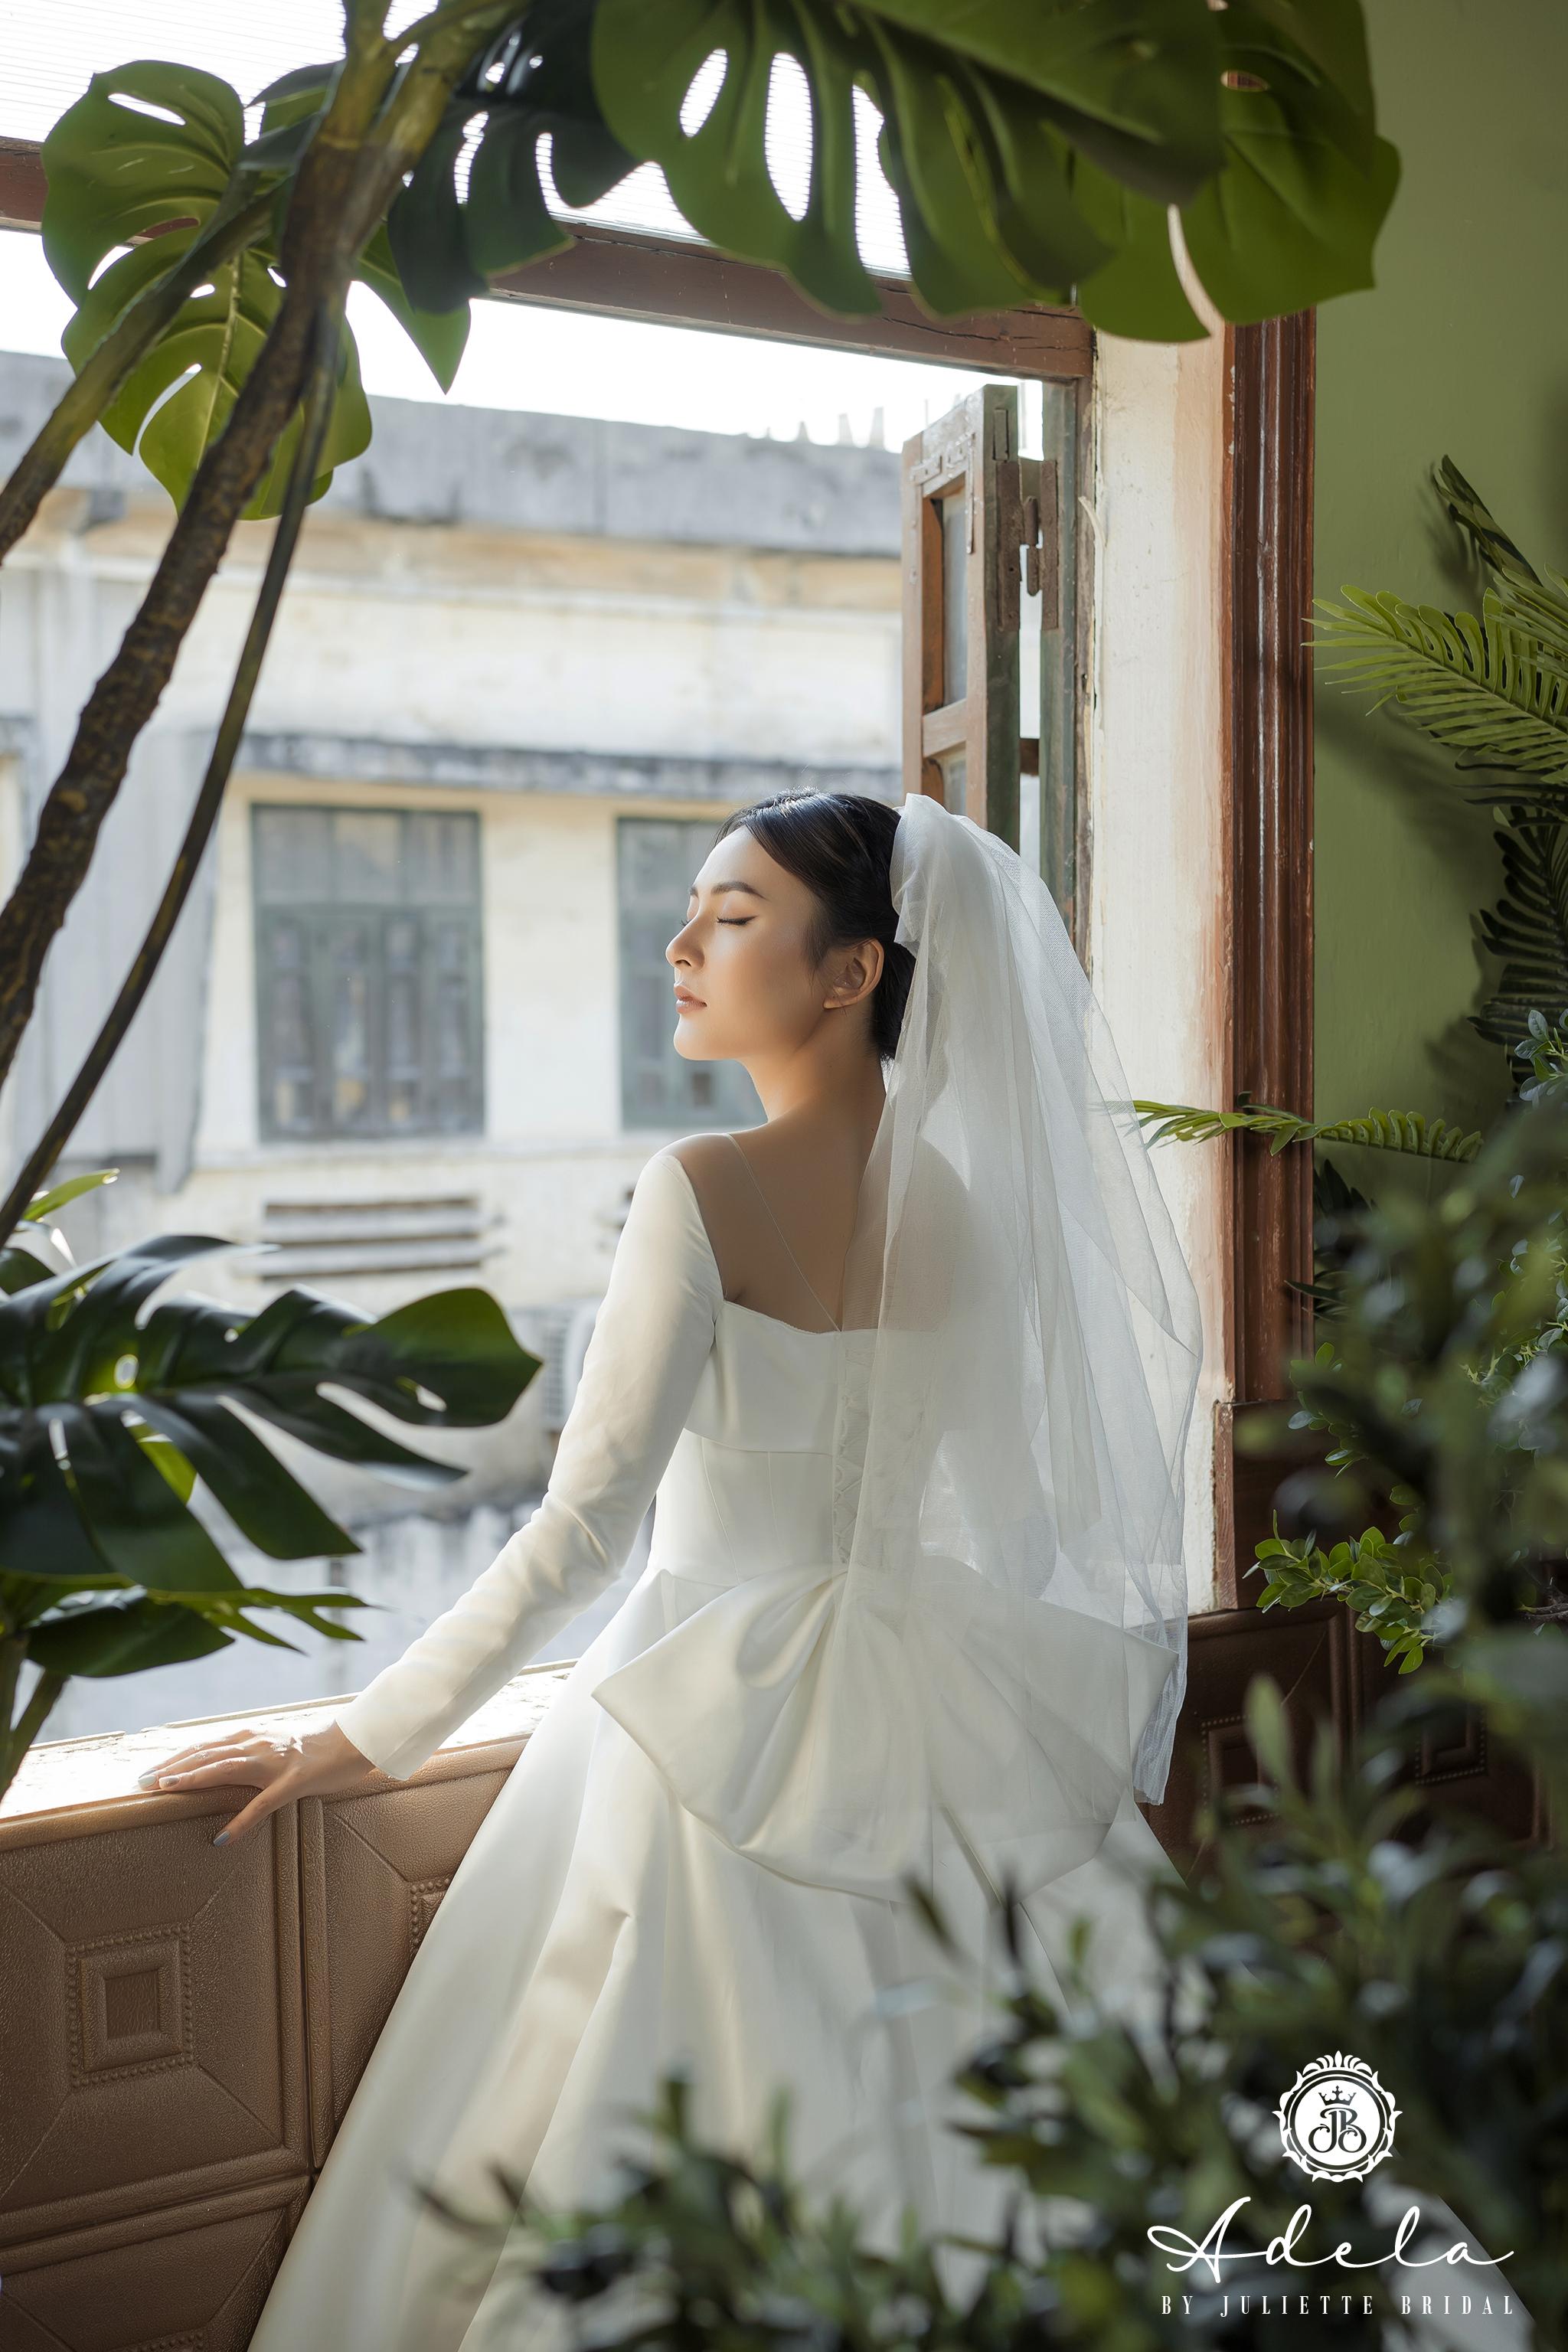 BST Adela (Adela Collection) | Top các mẫu váy cưới đơn giản 2021 15